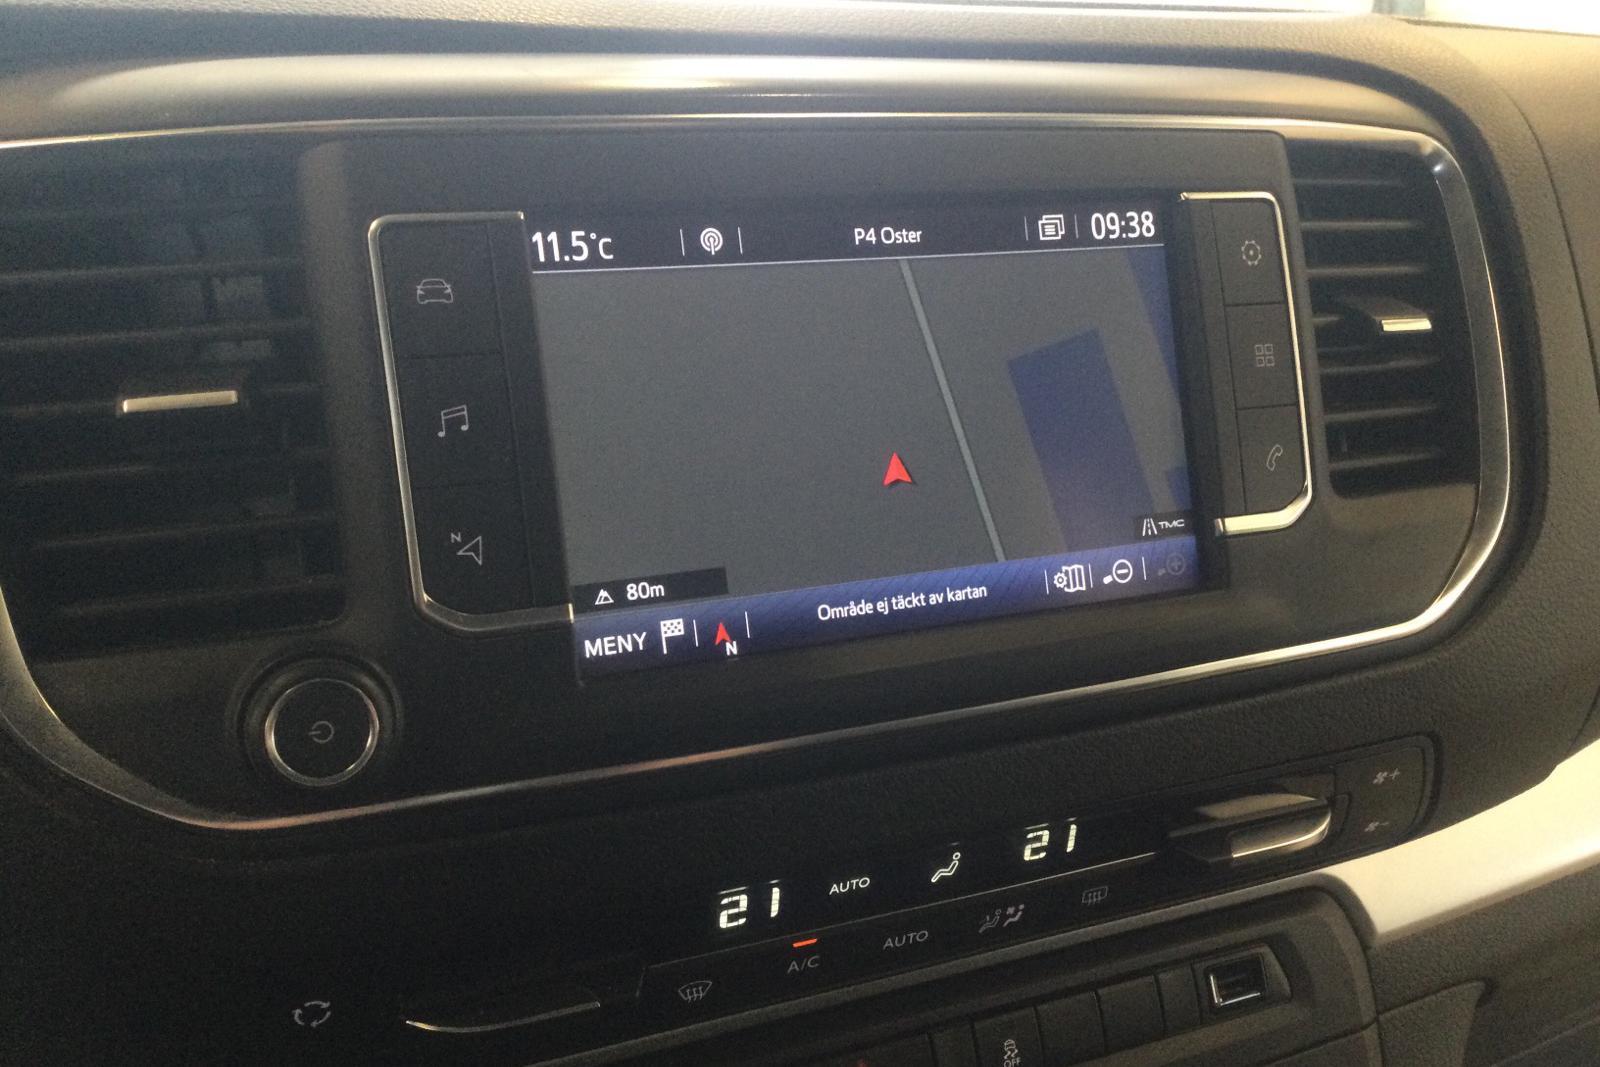 Toyota PROACE Verso 2.0D (150hk) - 89 560 km - Manual - white - 2017